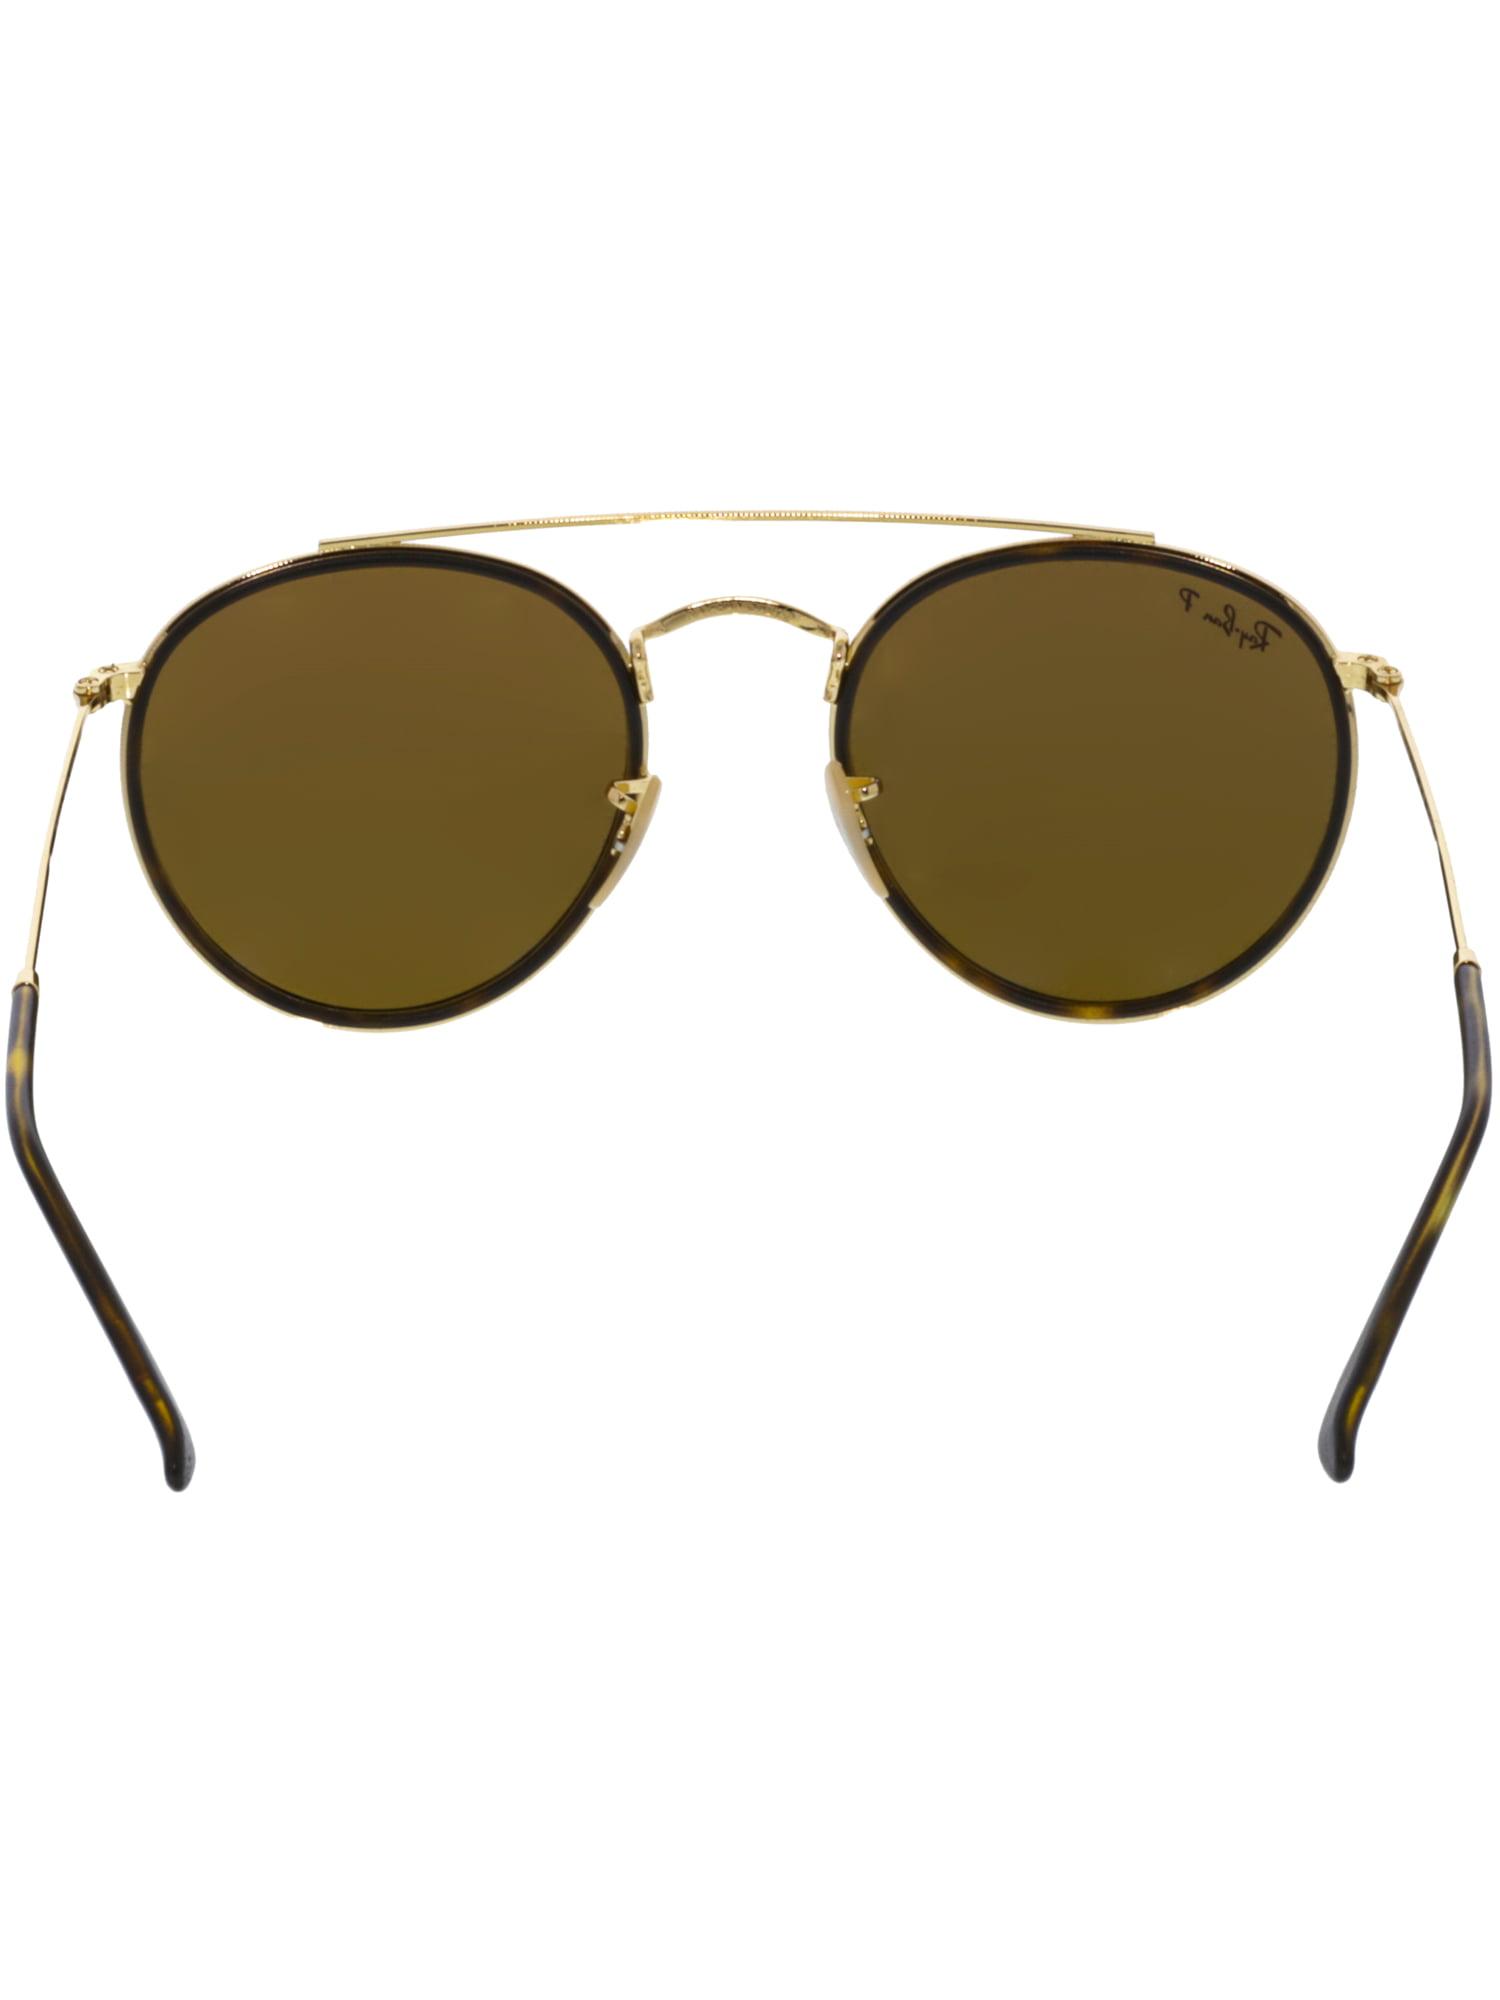 a9b3be75ffdc8 Ray-Ban - Ray-Ban Round Double Bridge Gold Sunglasses